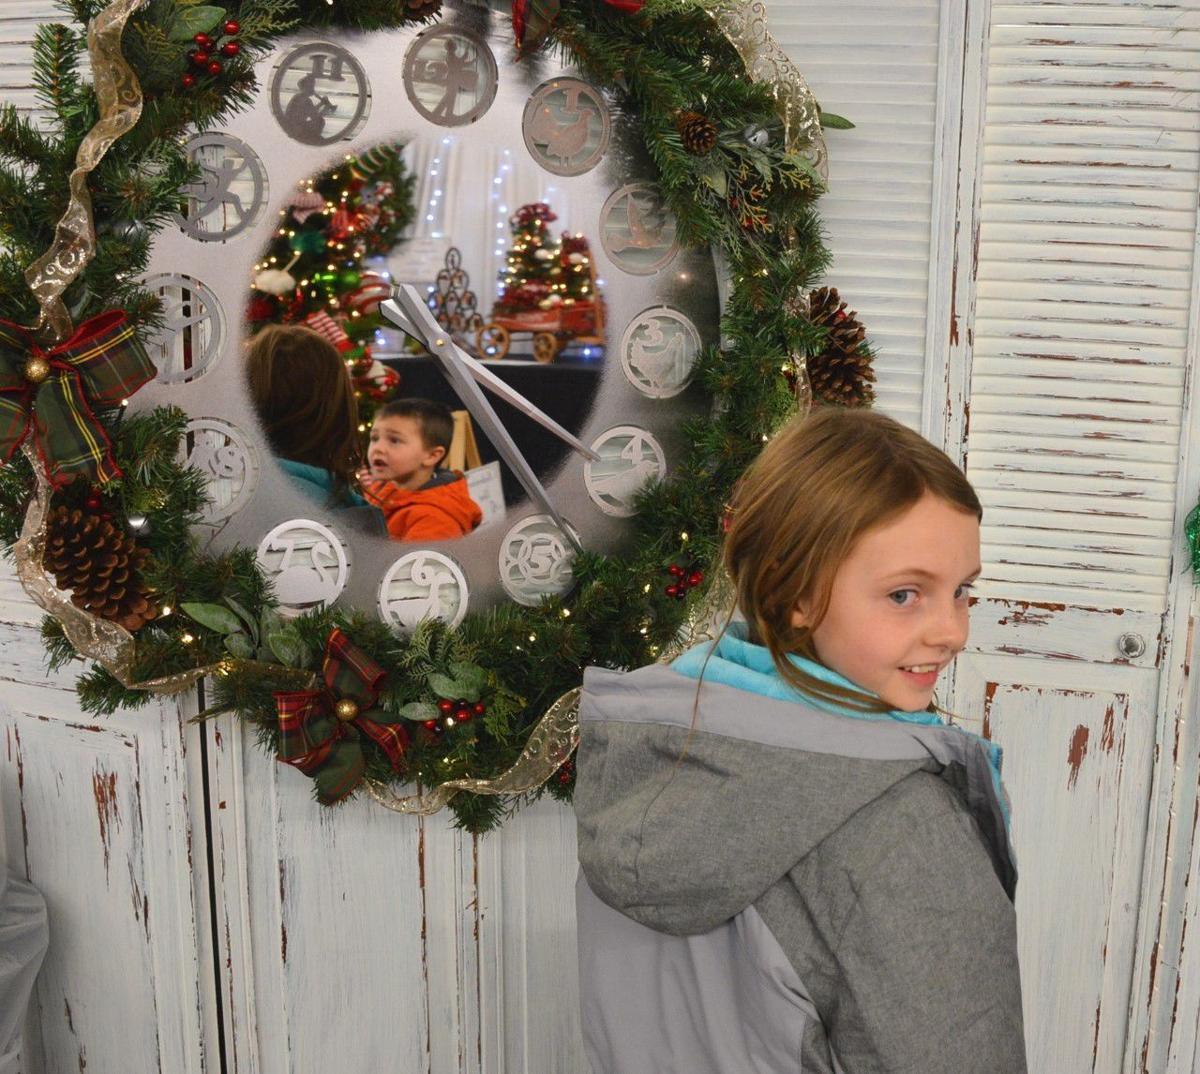 Christmas Tree Fantasy wraps up for season